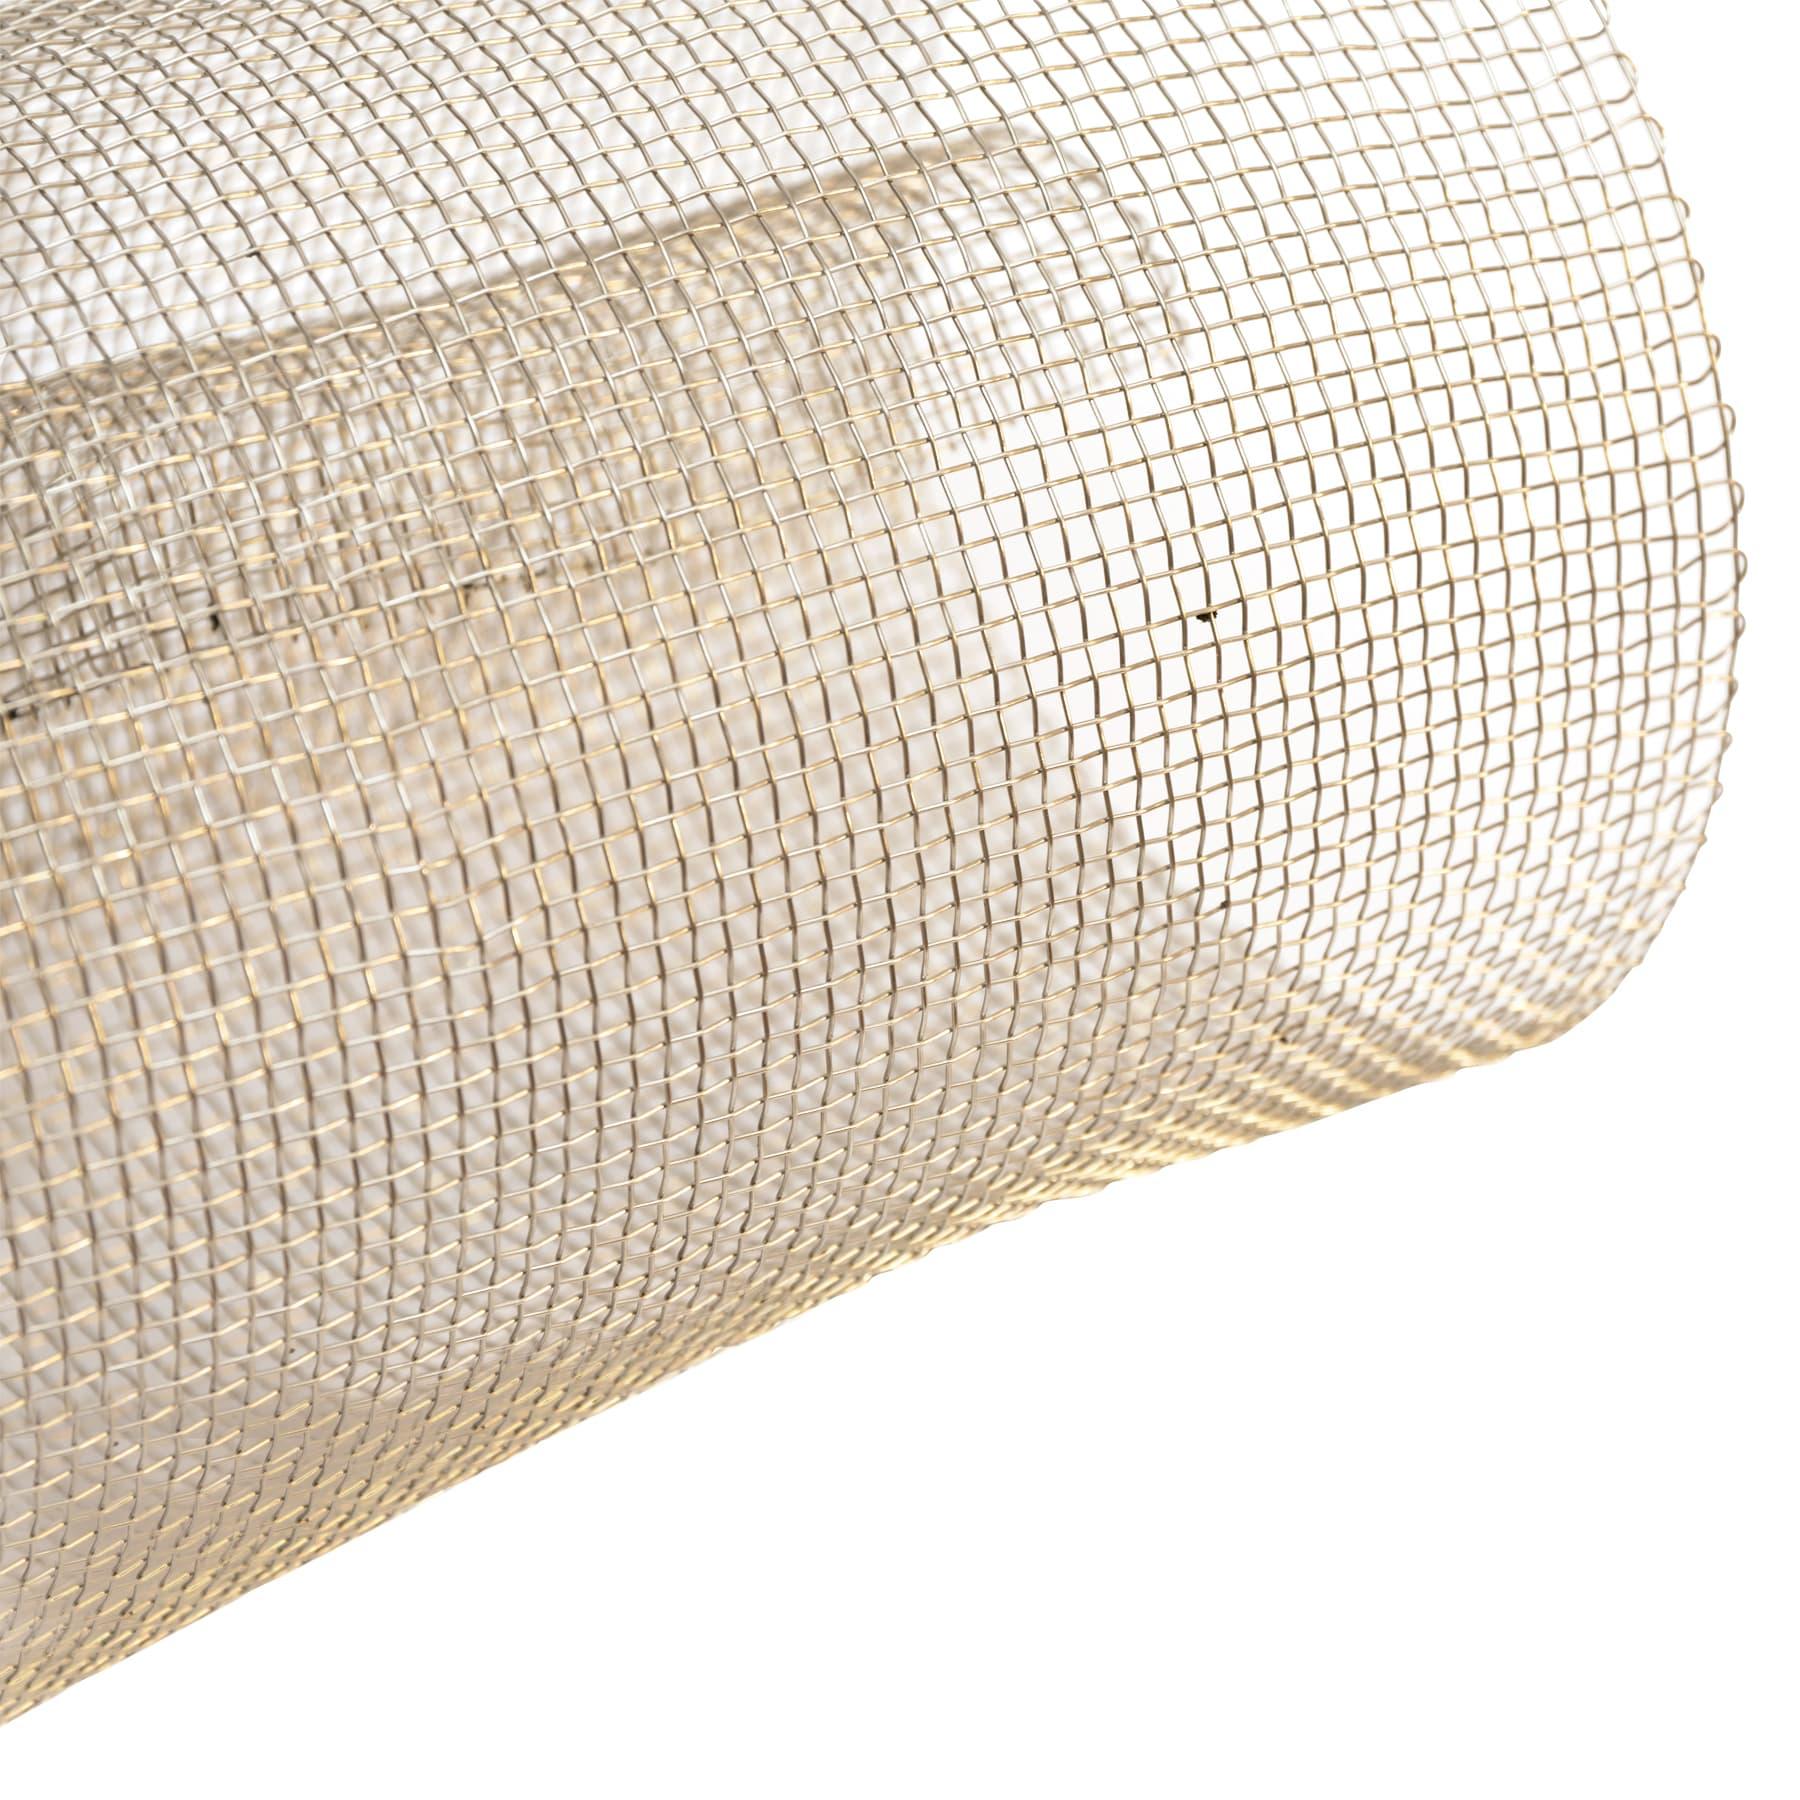 Edelstahldrahtgewebe 2,7 mm , ca 51 cm breit lfdm